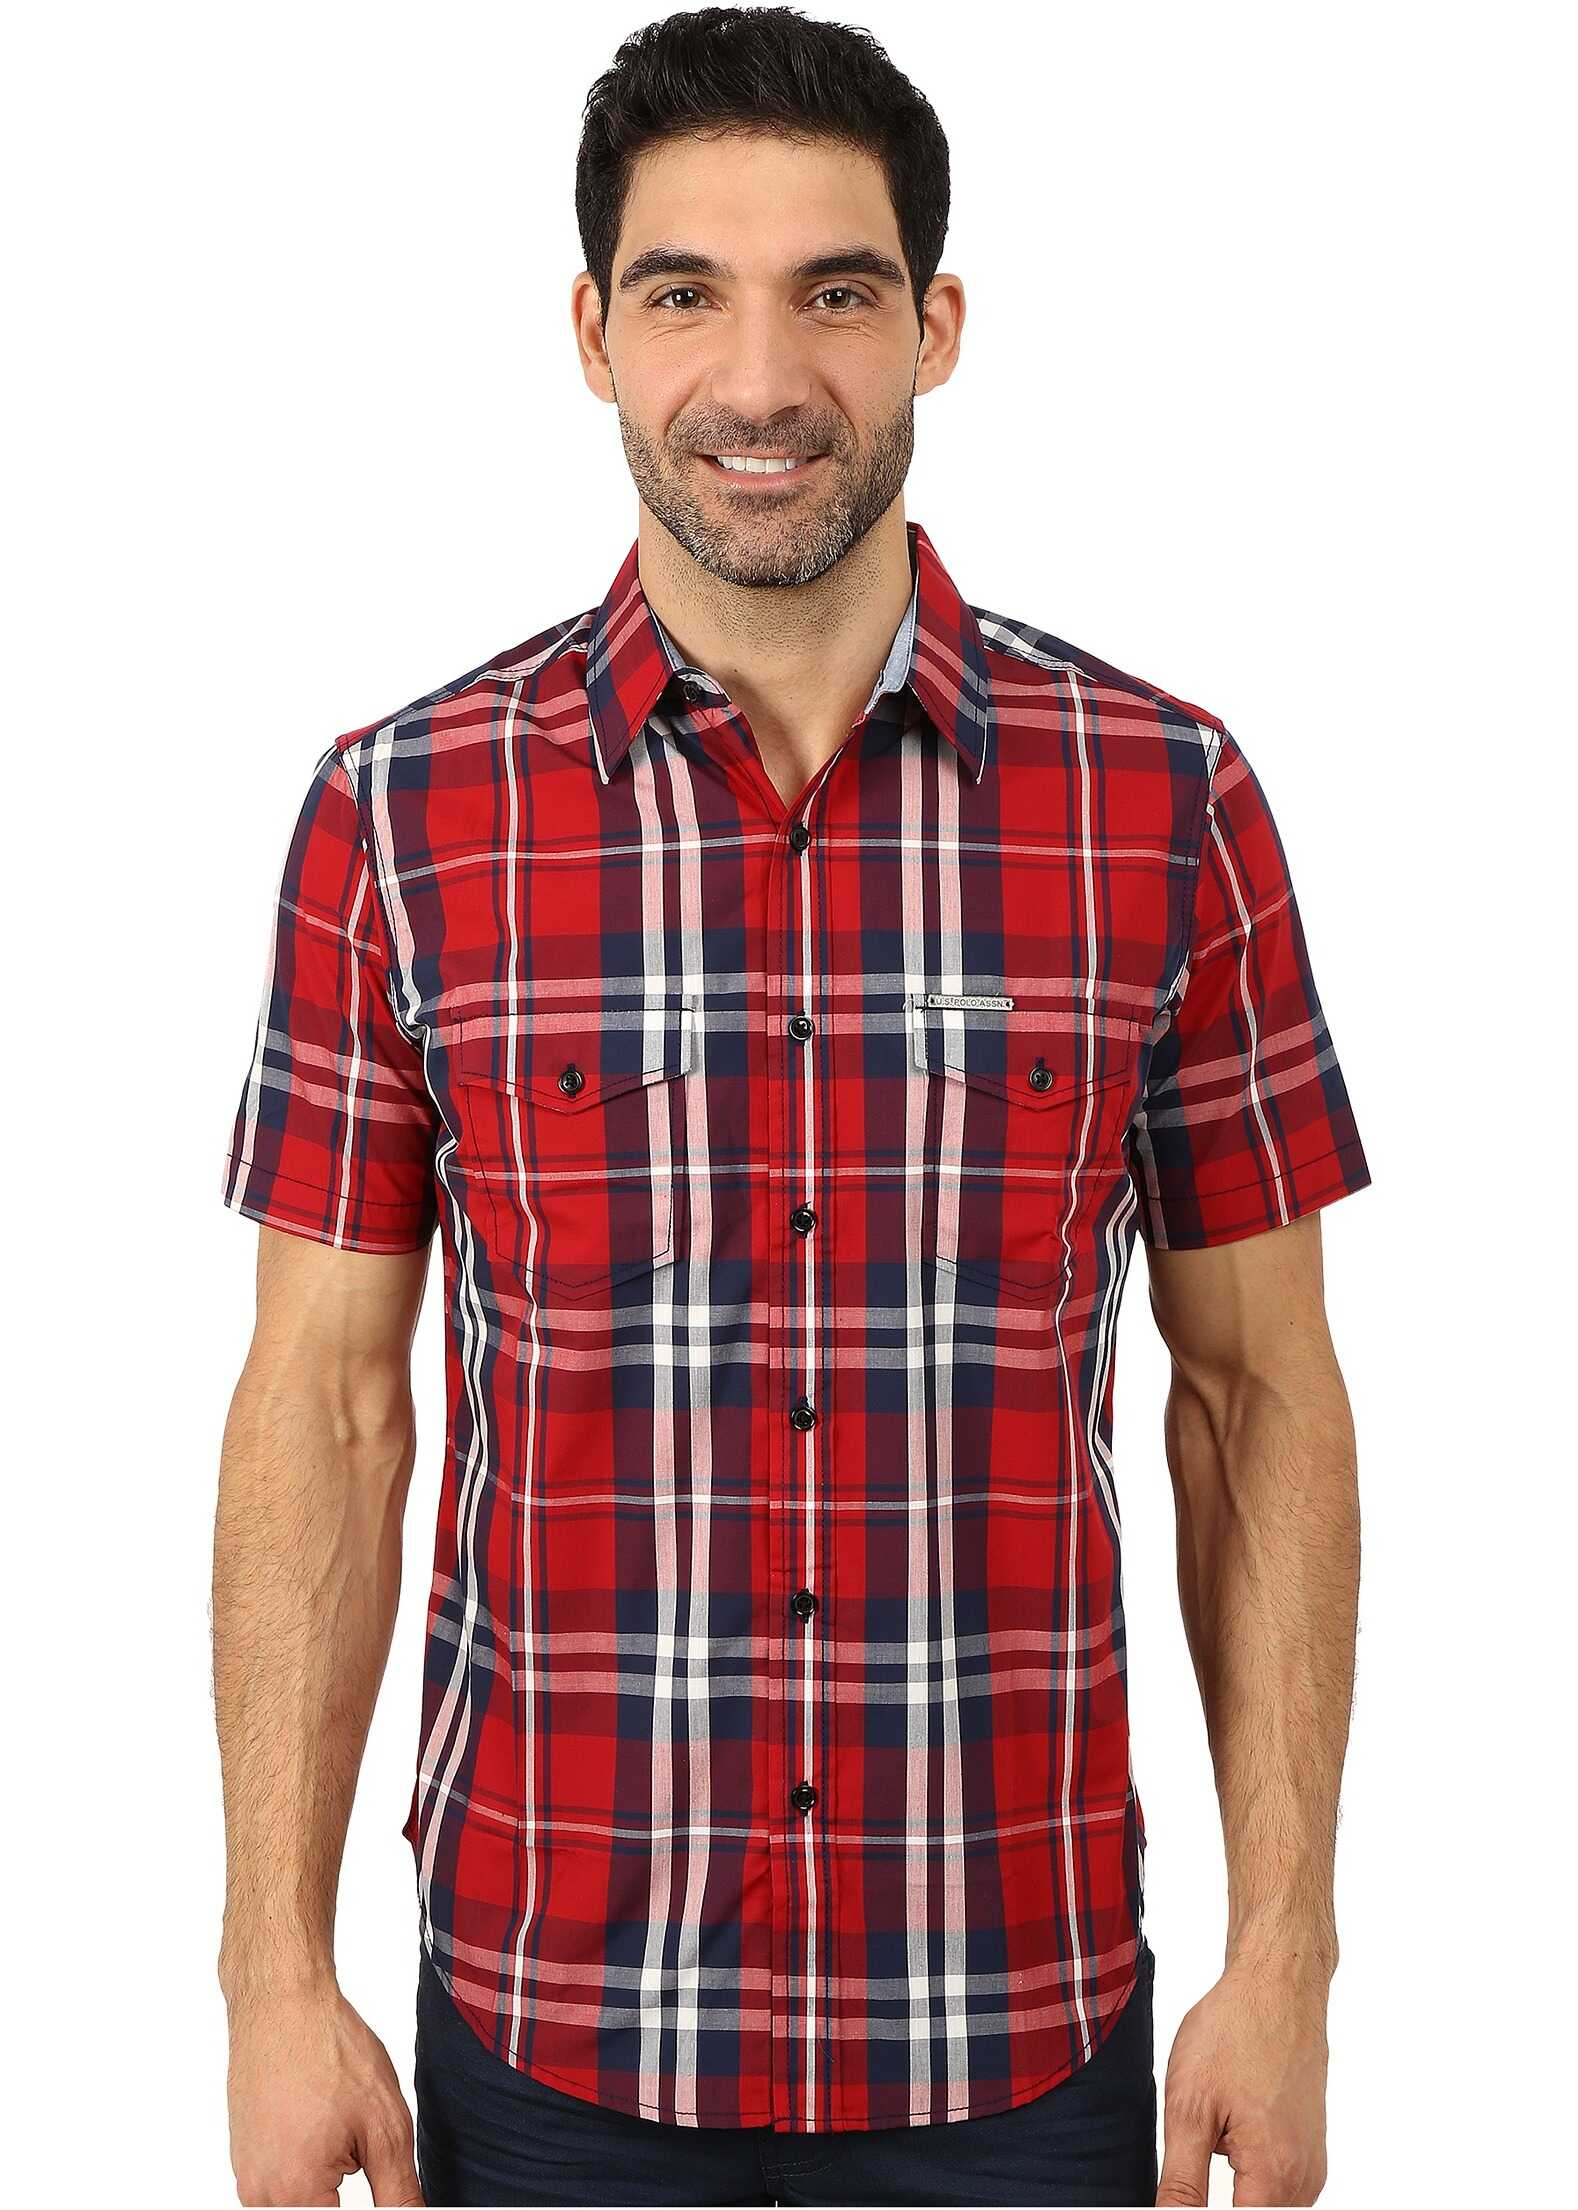 U.S. POLO ASSN. Slim Fit Short Sleeve Plaid Sport Shirt Apple Cinnamon